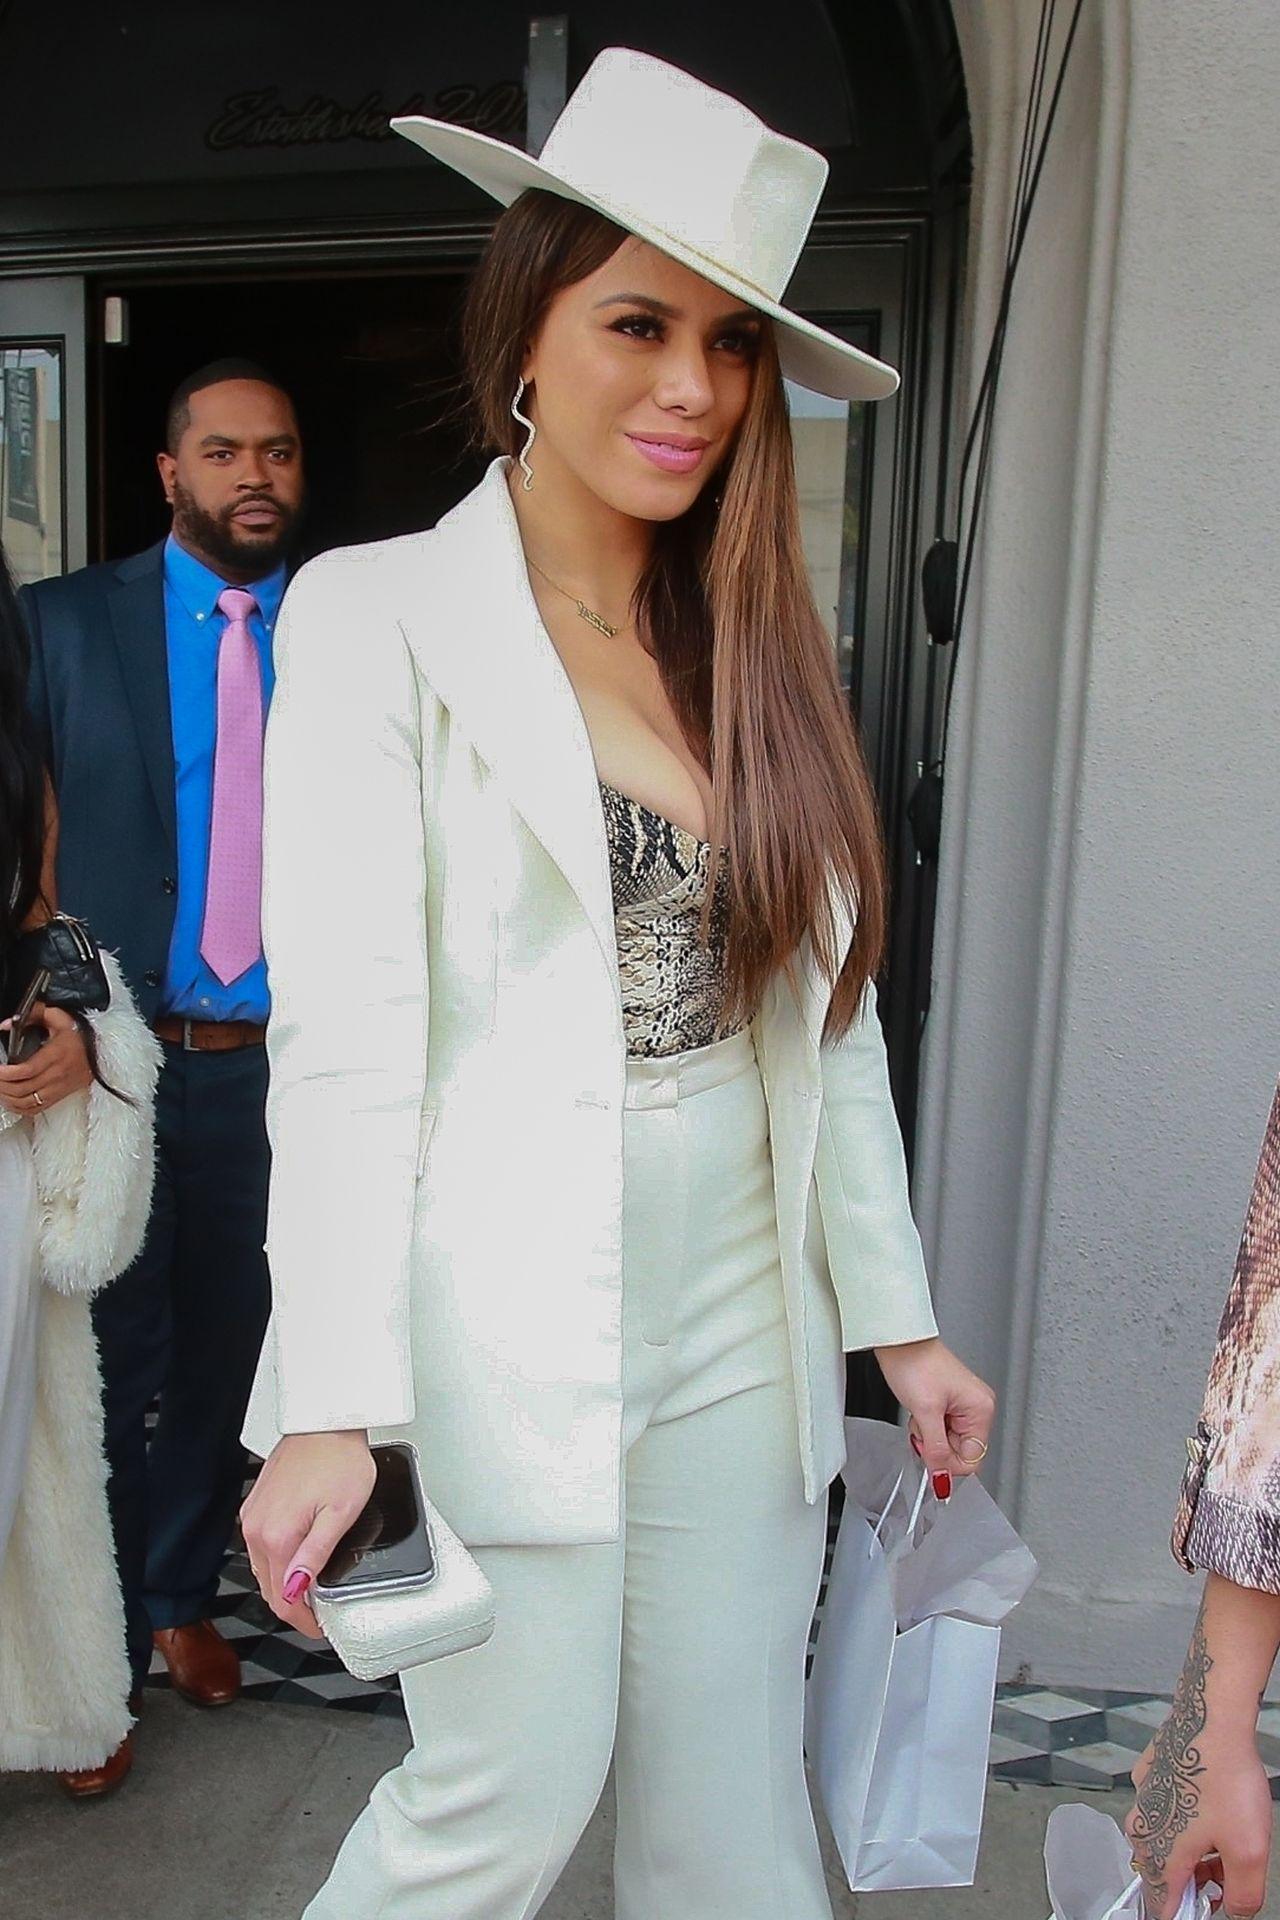 Dinah Jane Departs The Women In Harmony Pre Grammy Luncheon 0005